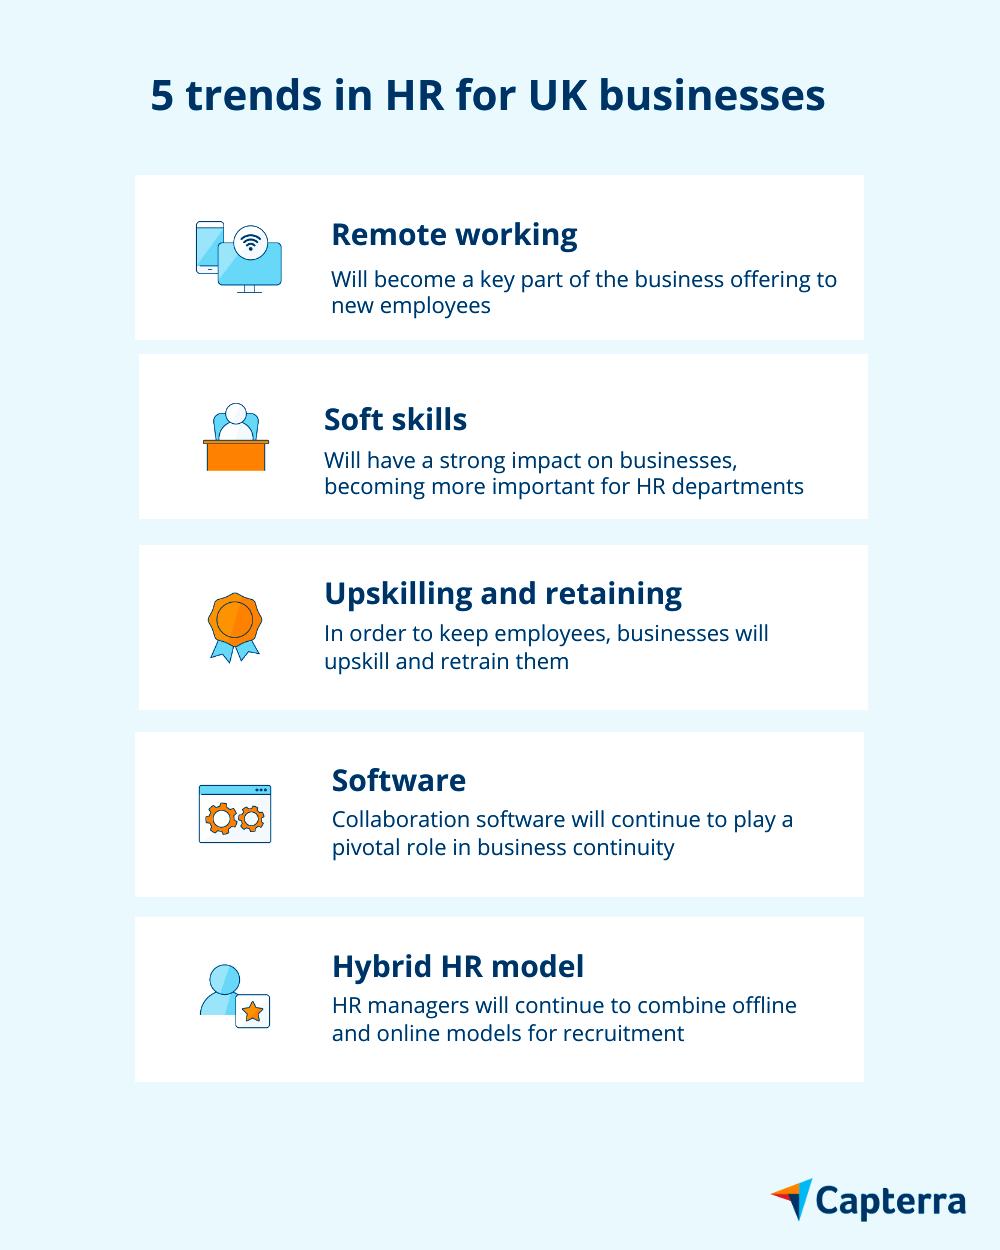 5 HR trends in the UK